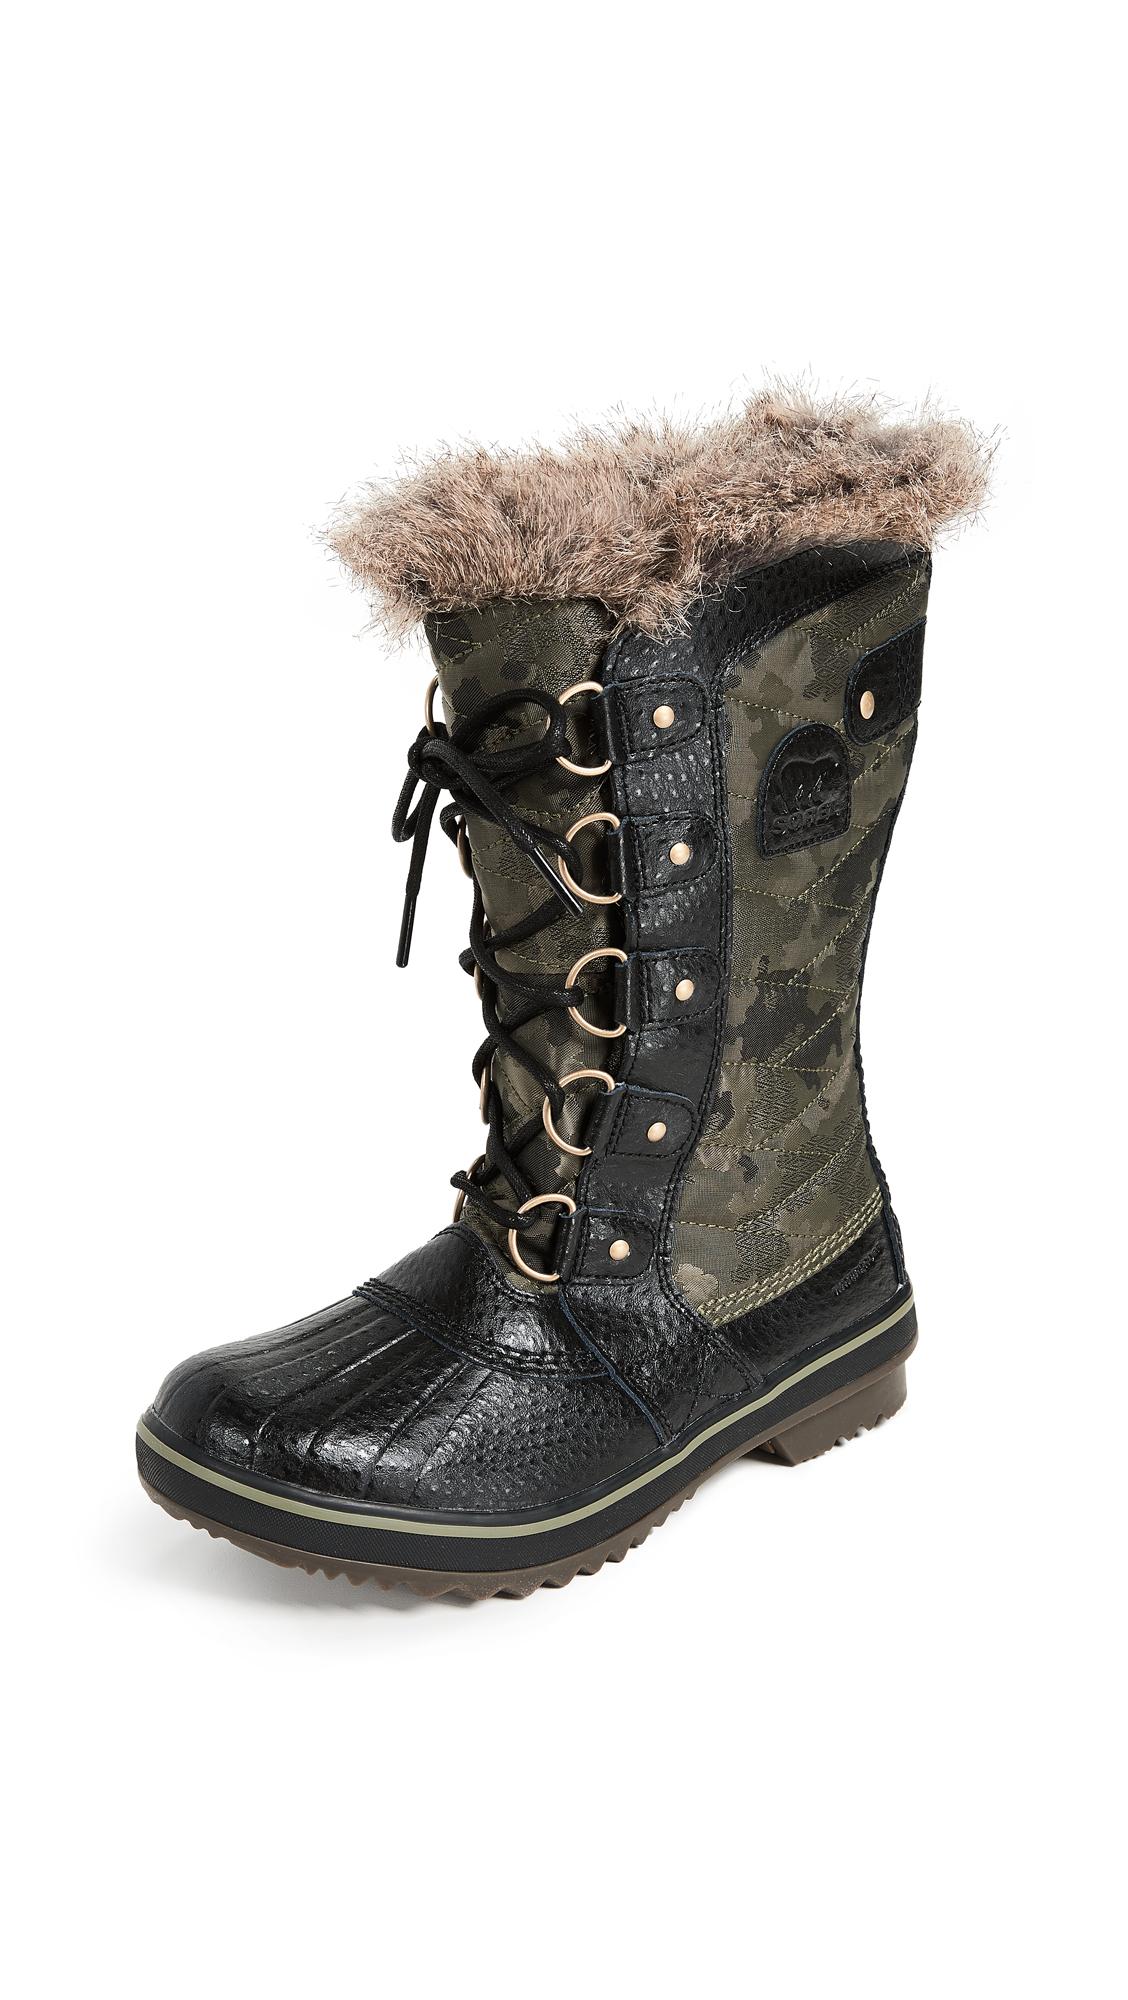 Sorel Tofino II Boots - Camo/Hiker Green